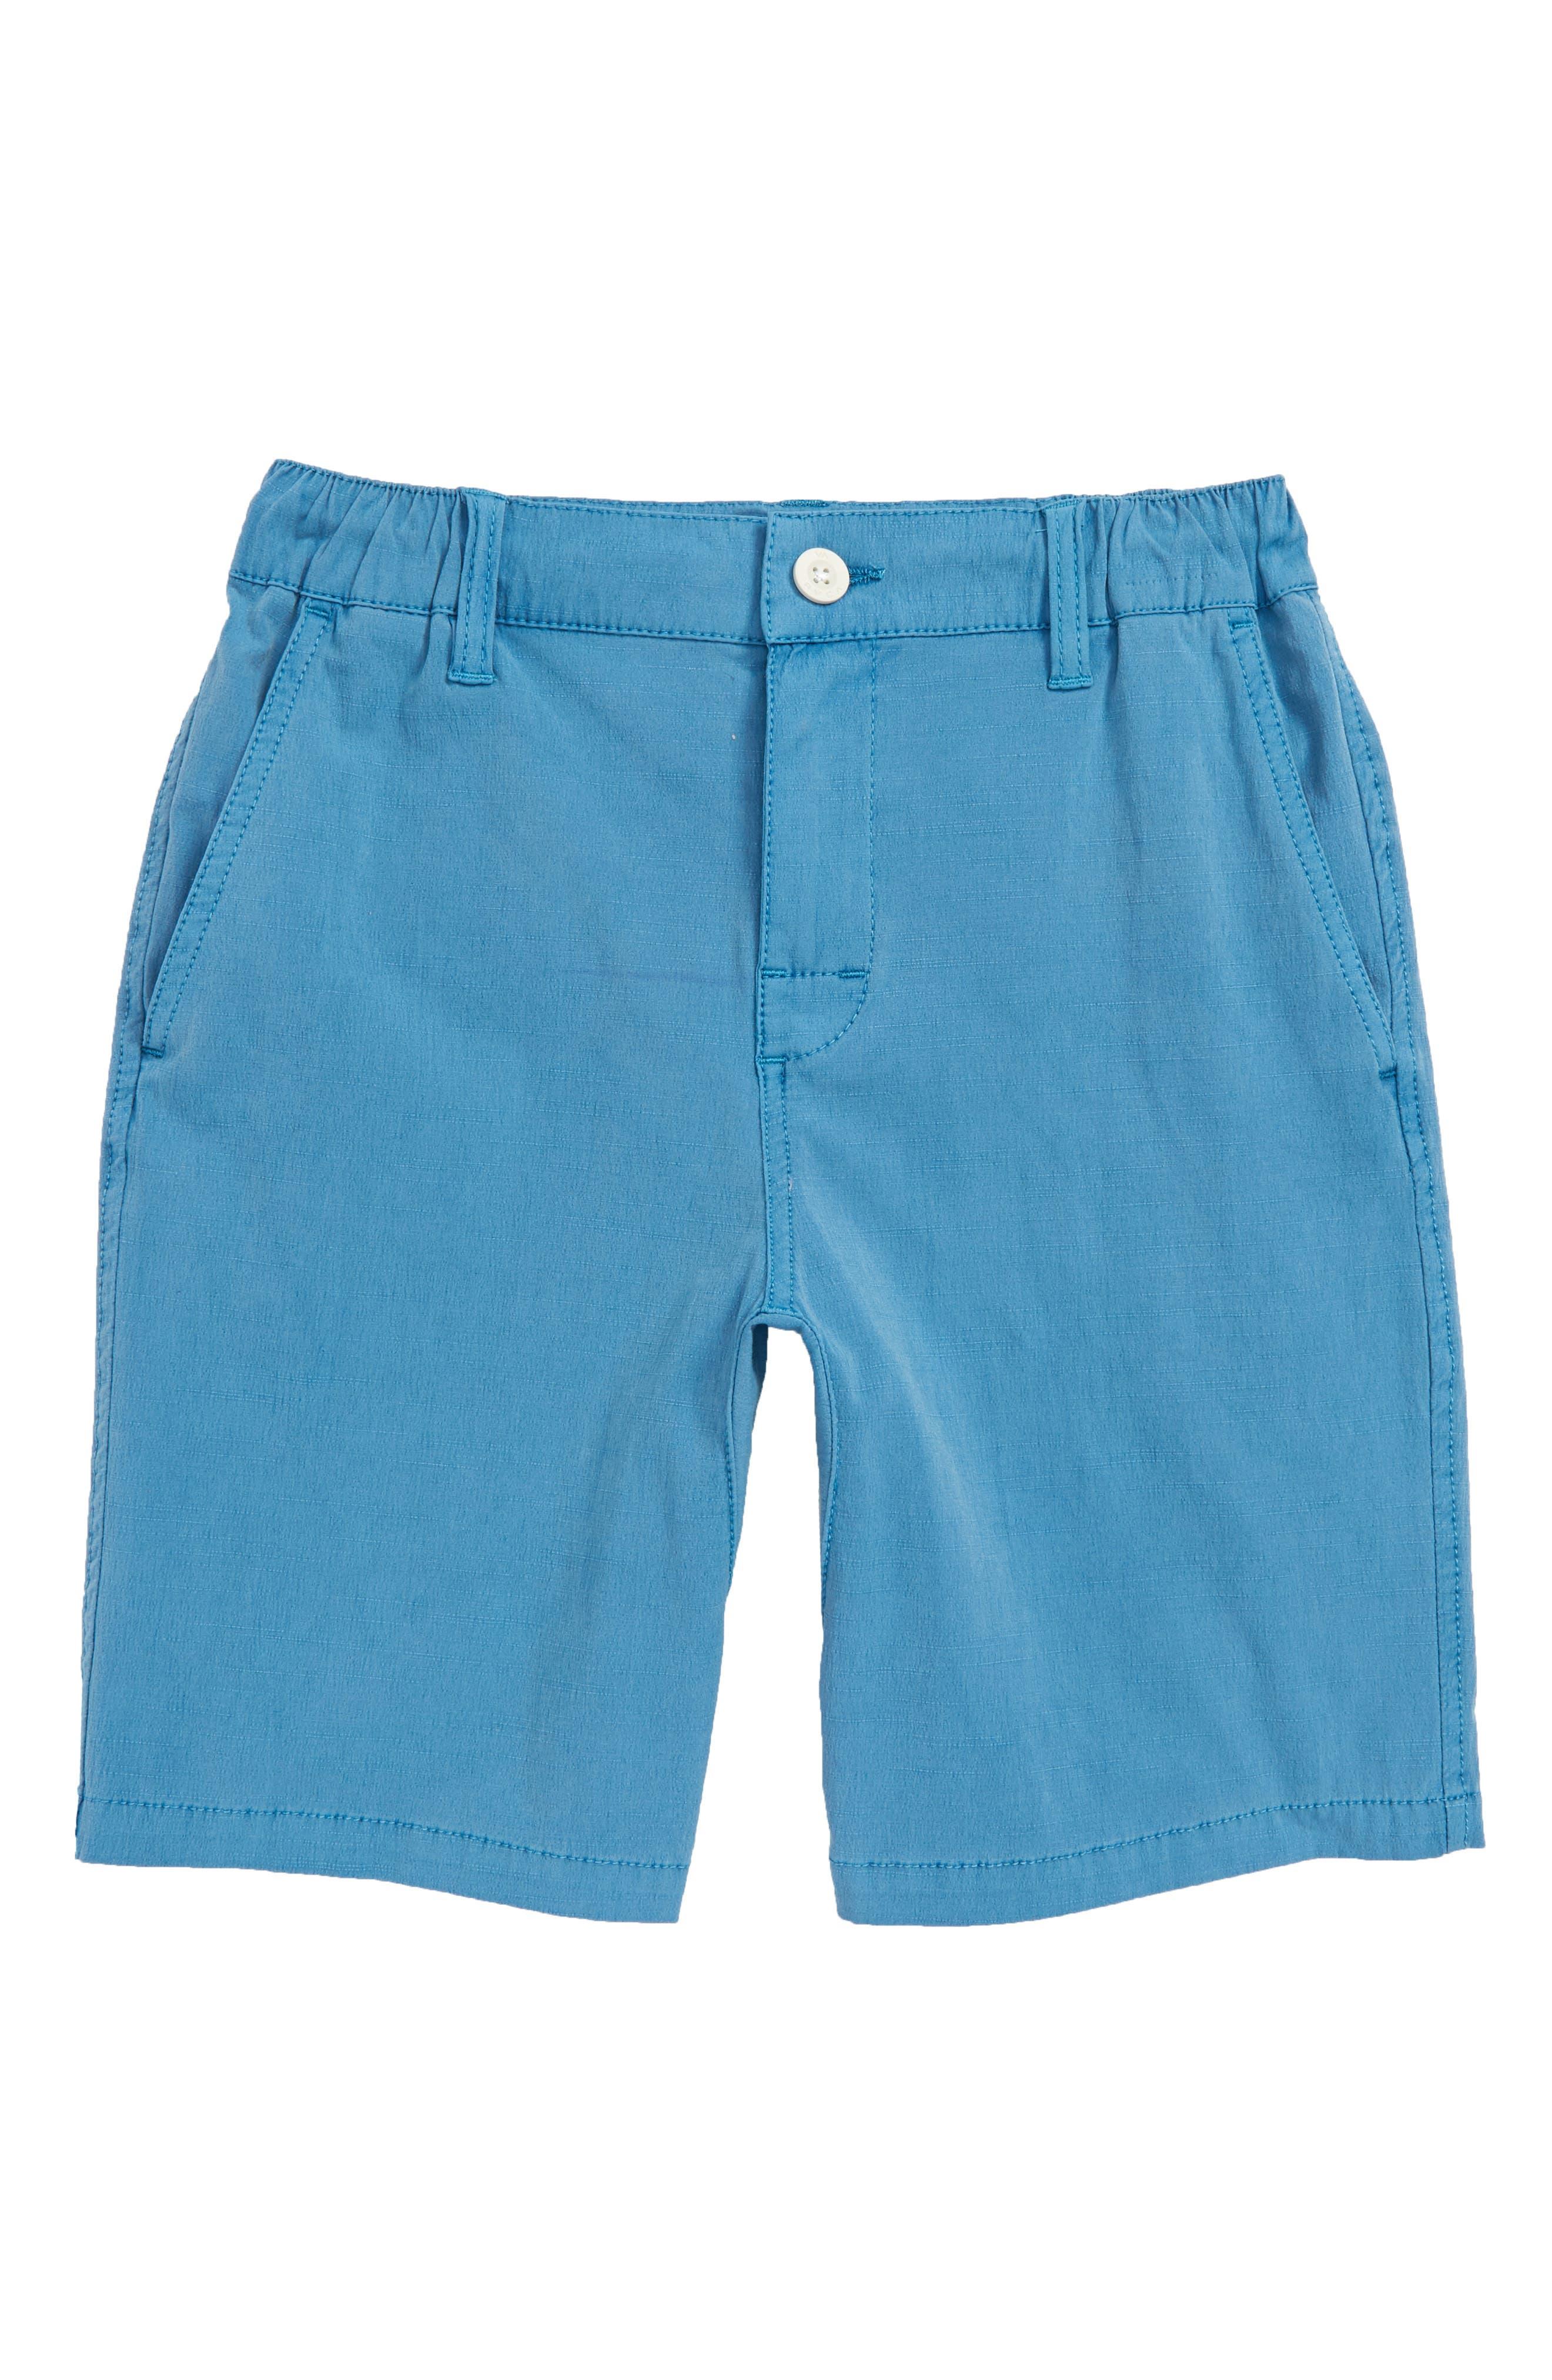 All Time Coastal SOL Hybrid Shorts,                             Main thumbnail 1, color,                             LAGOON